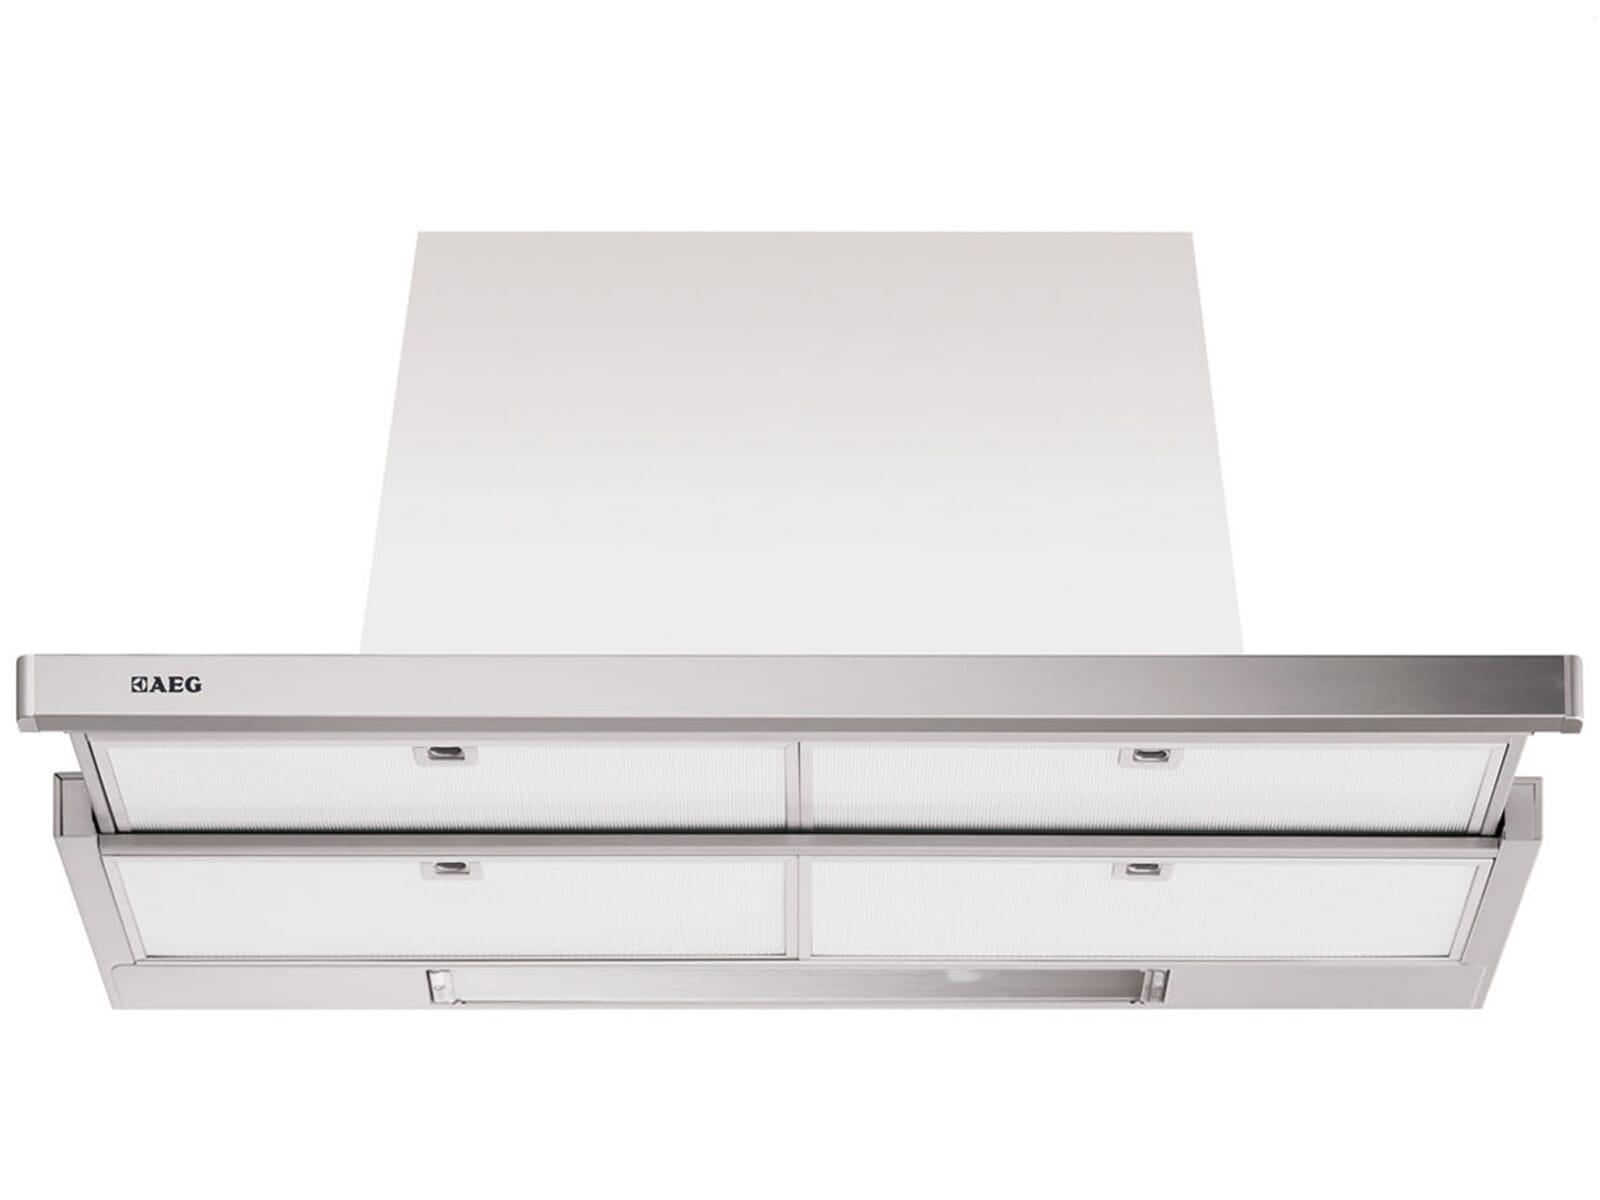 aeg df7190 m flachschirm dunstabzugshaube edelstahl. Black Bedroom Furniture Sets. Home Design Ideas